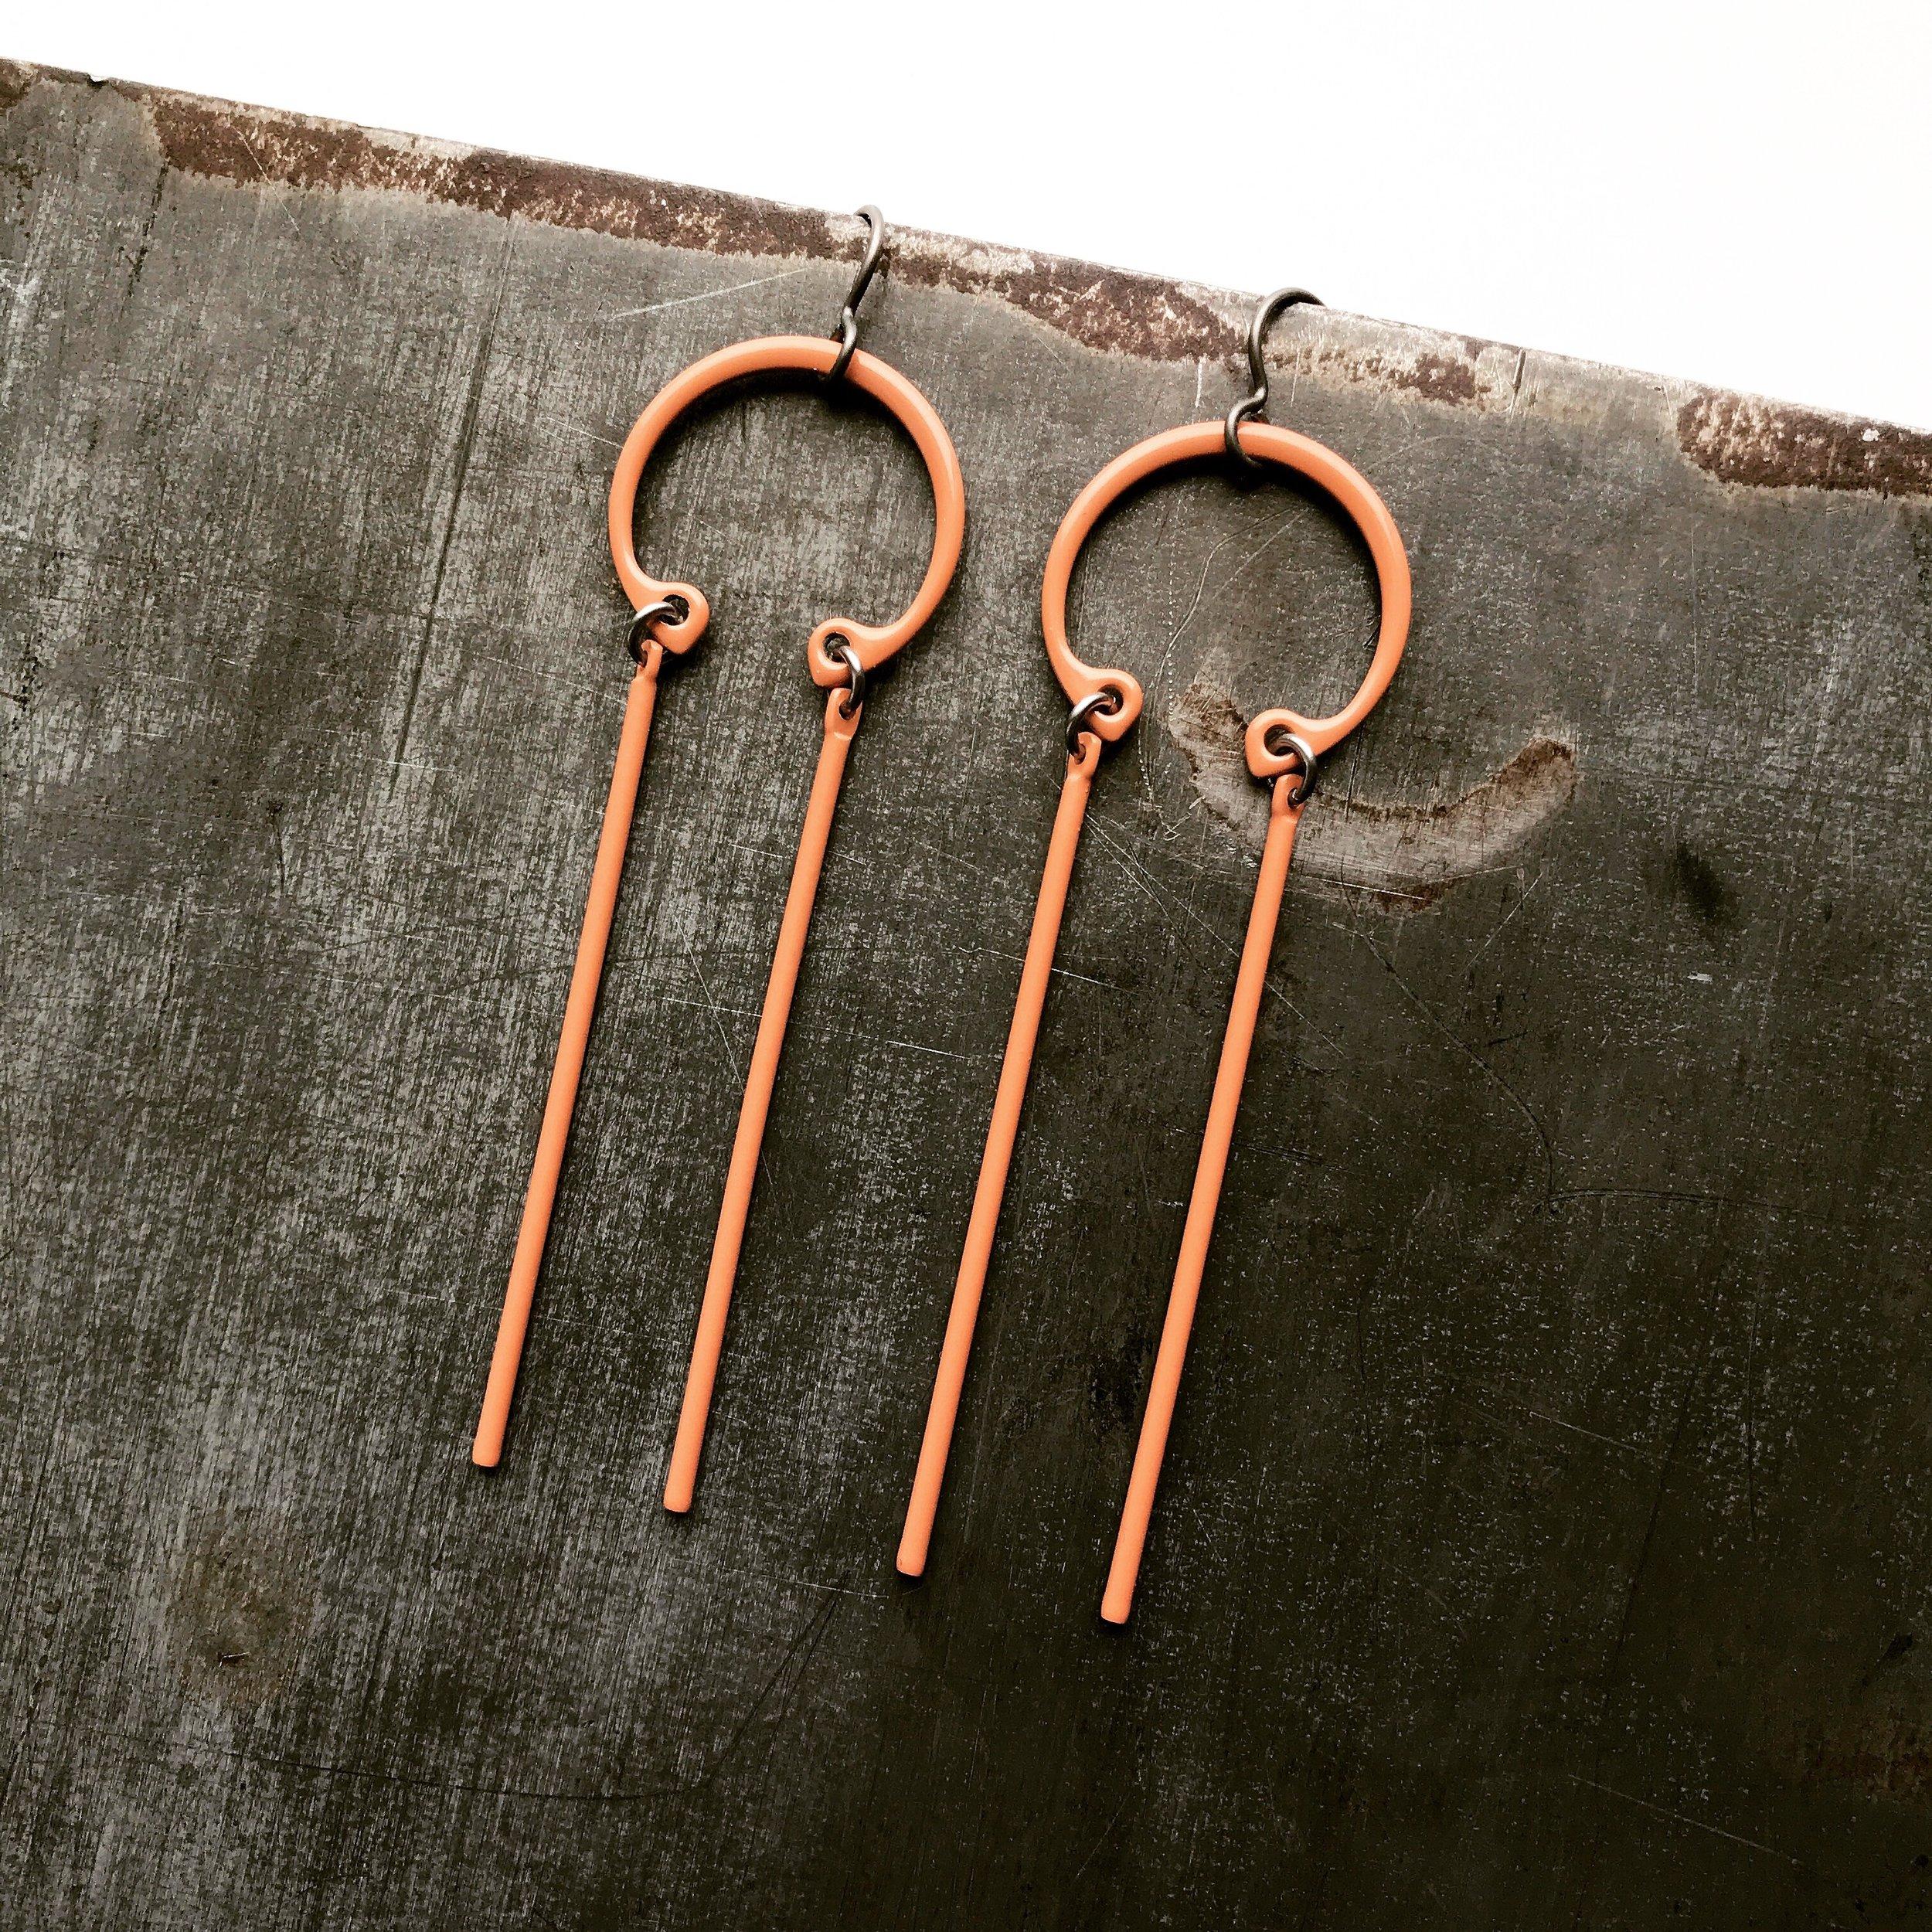 Industrial Stick earrings, niobium ear wire, sienna powder coated steel components, $70